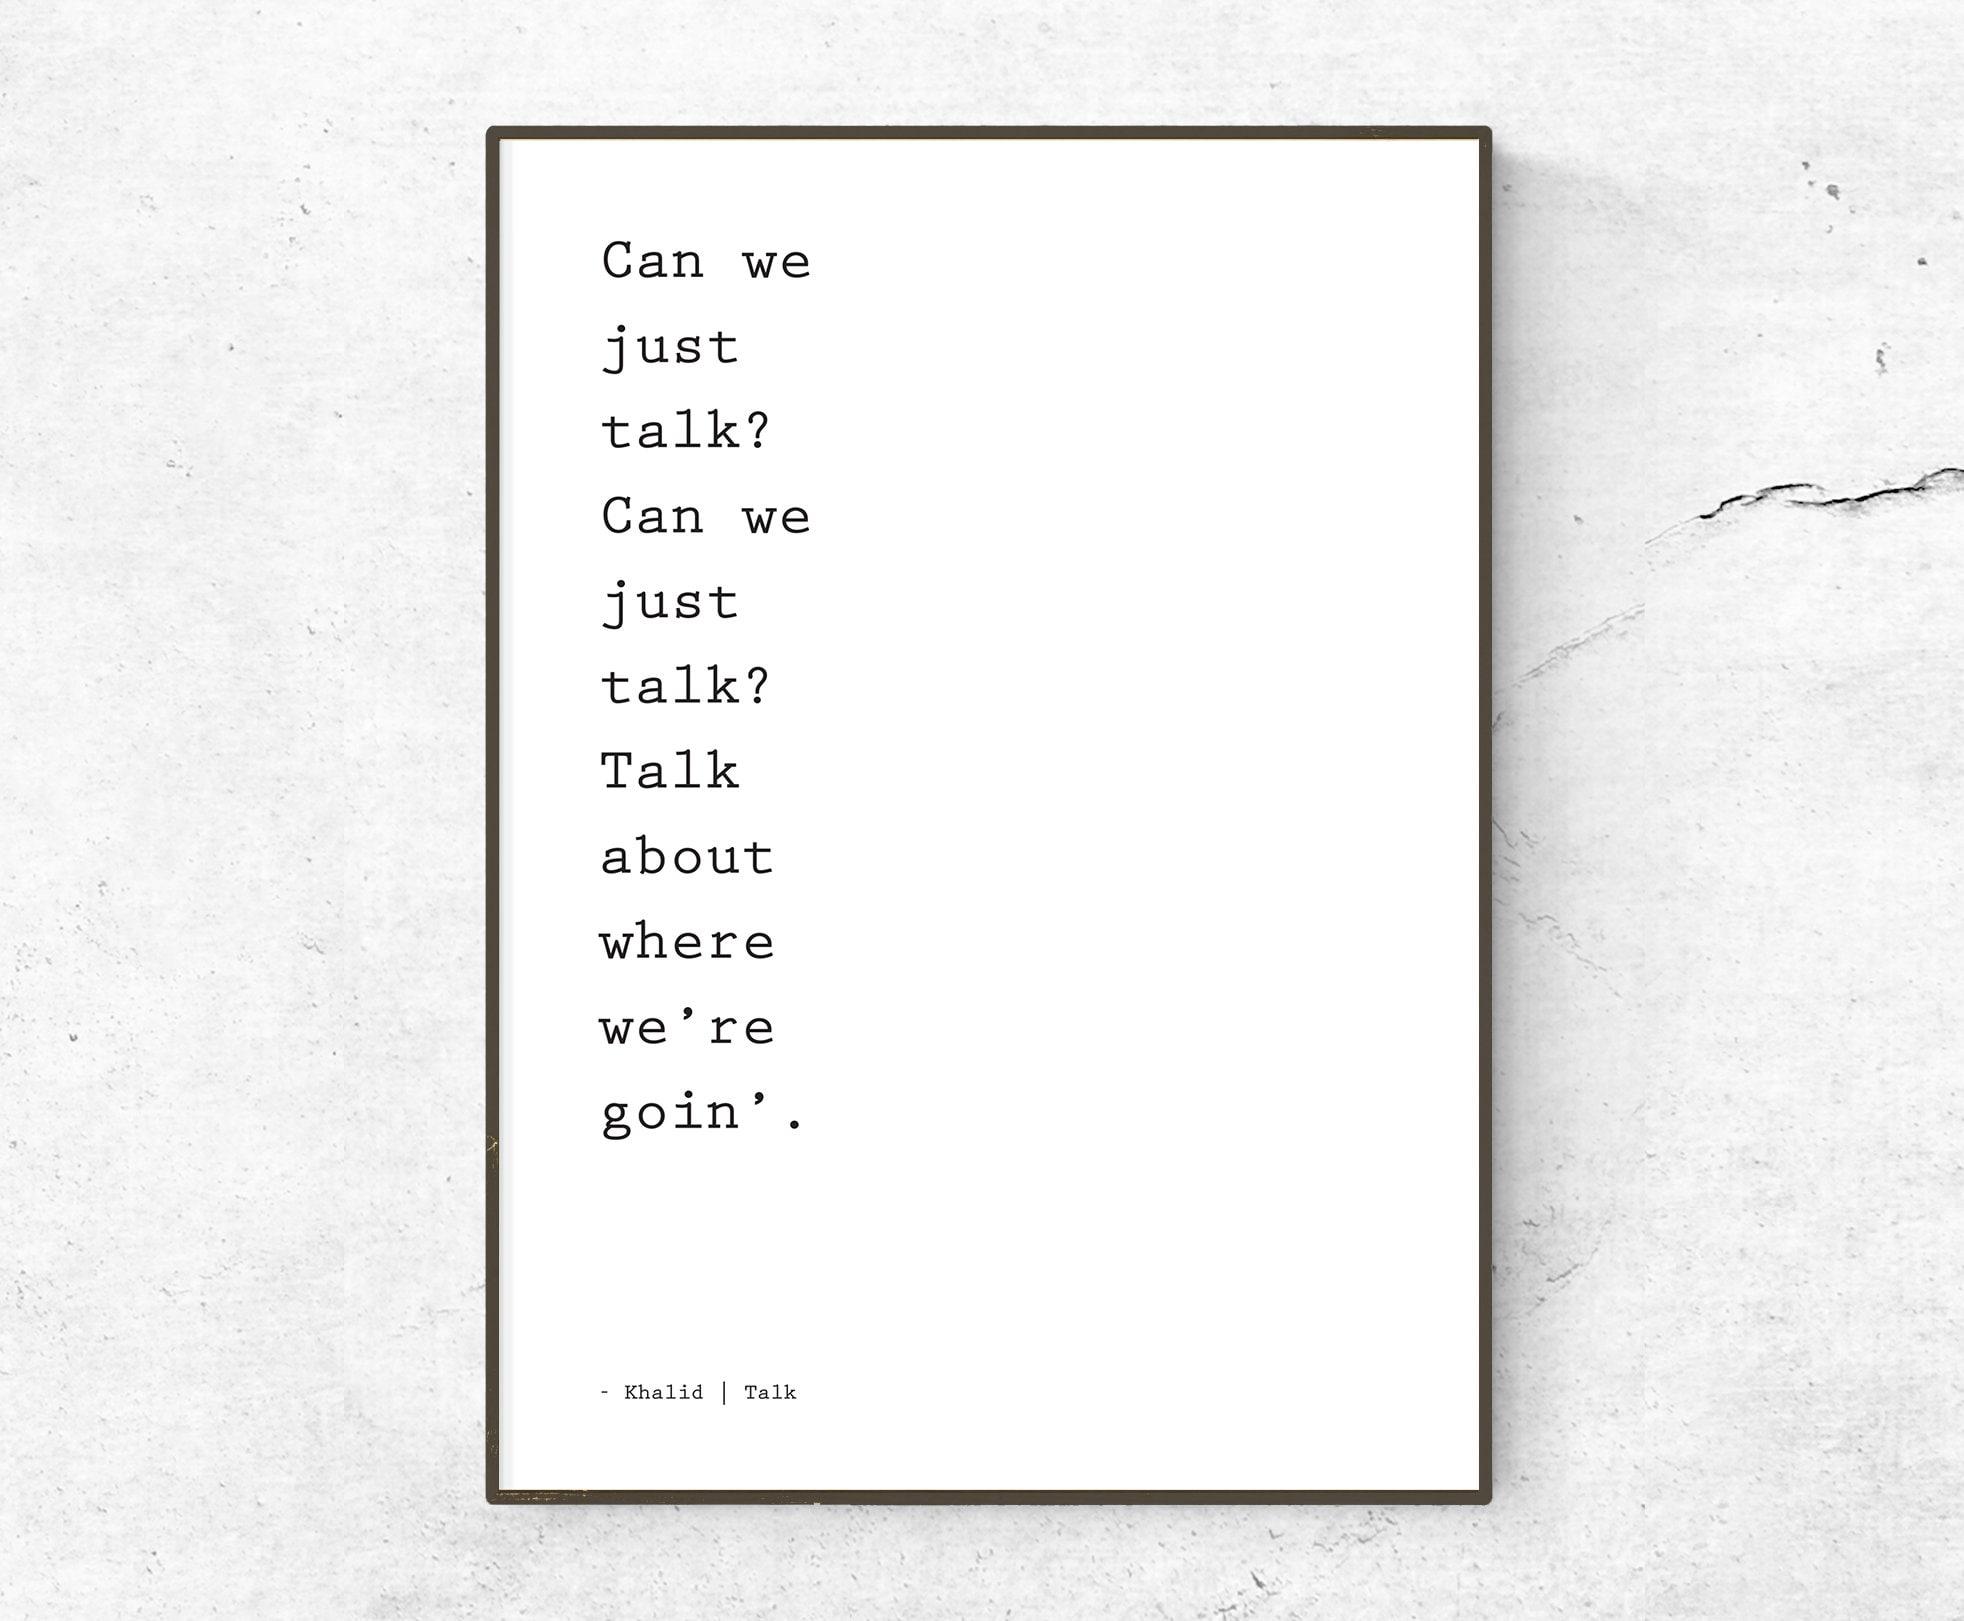 Khalid / Talk Lyrics quote / poster / print / song lyrics poster / home  decor / Can we just talk? Can we just talk? Talk about where we're